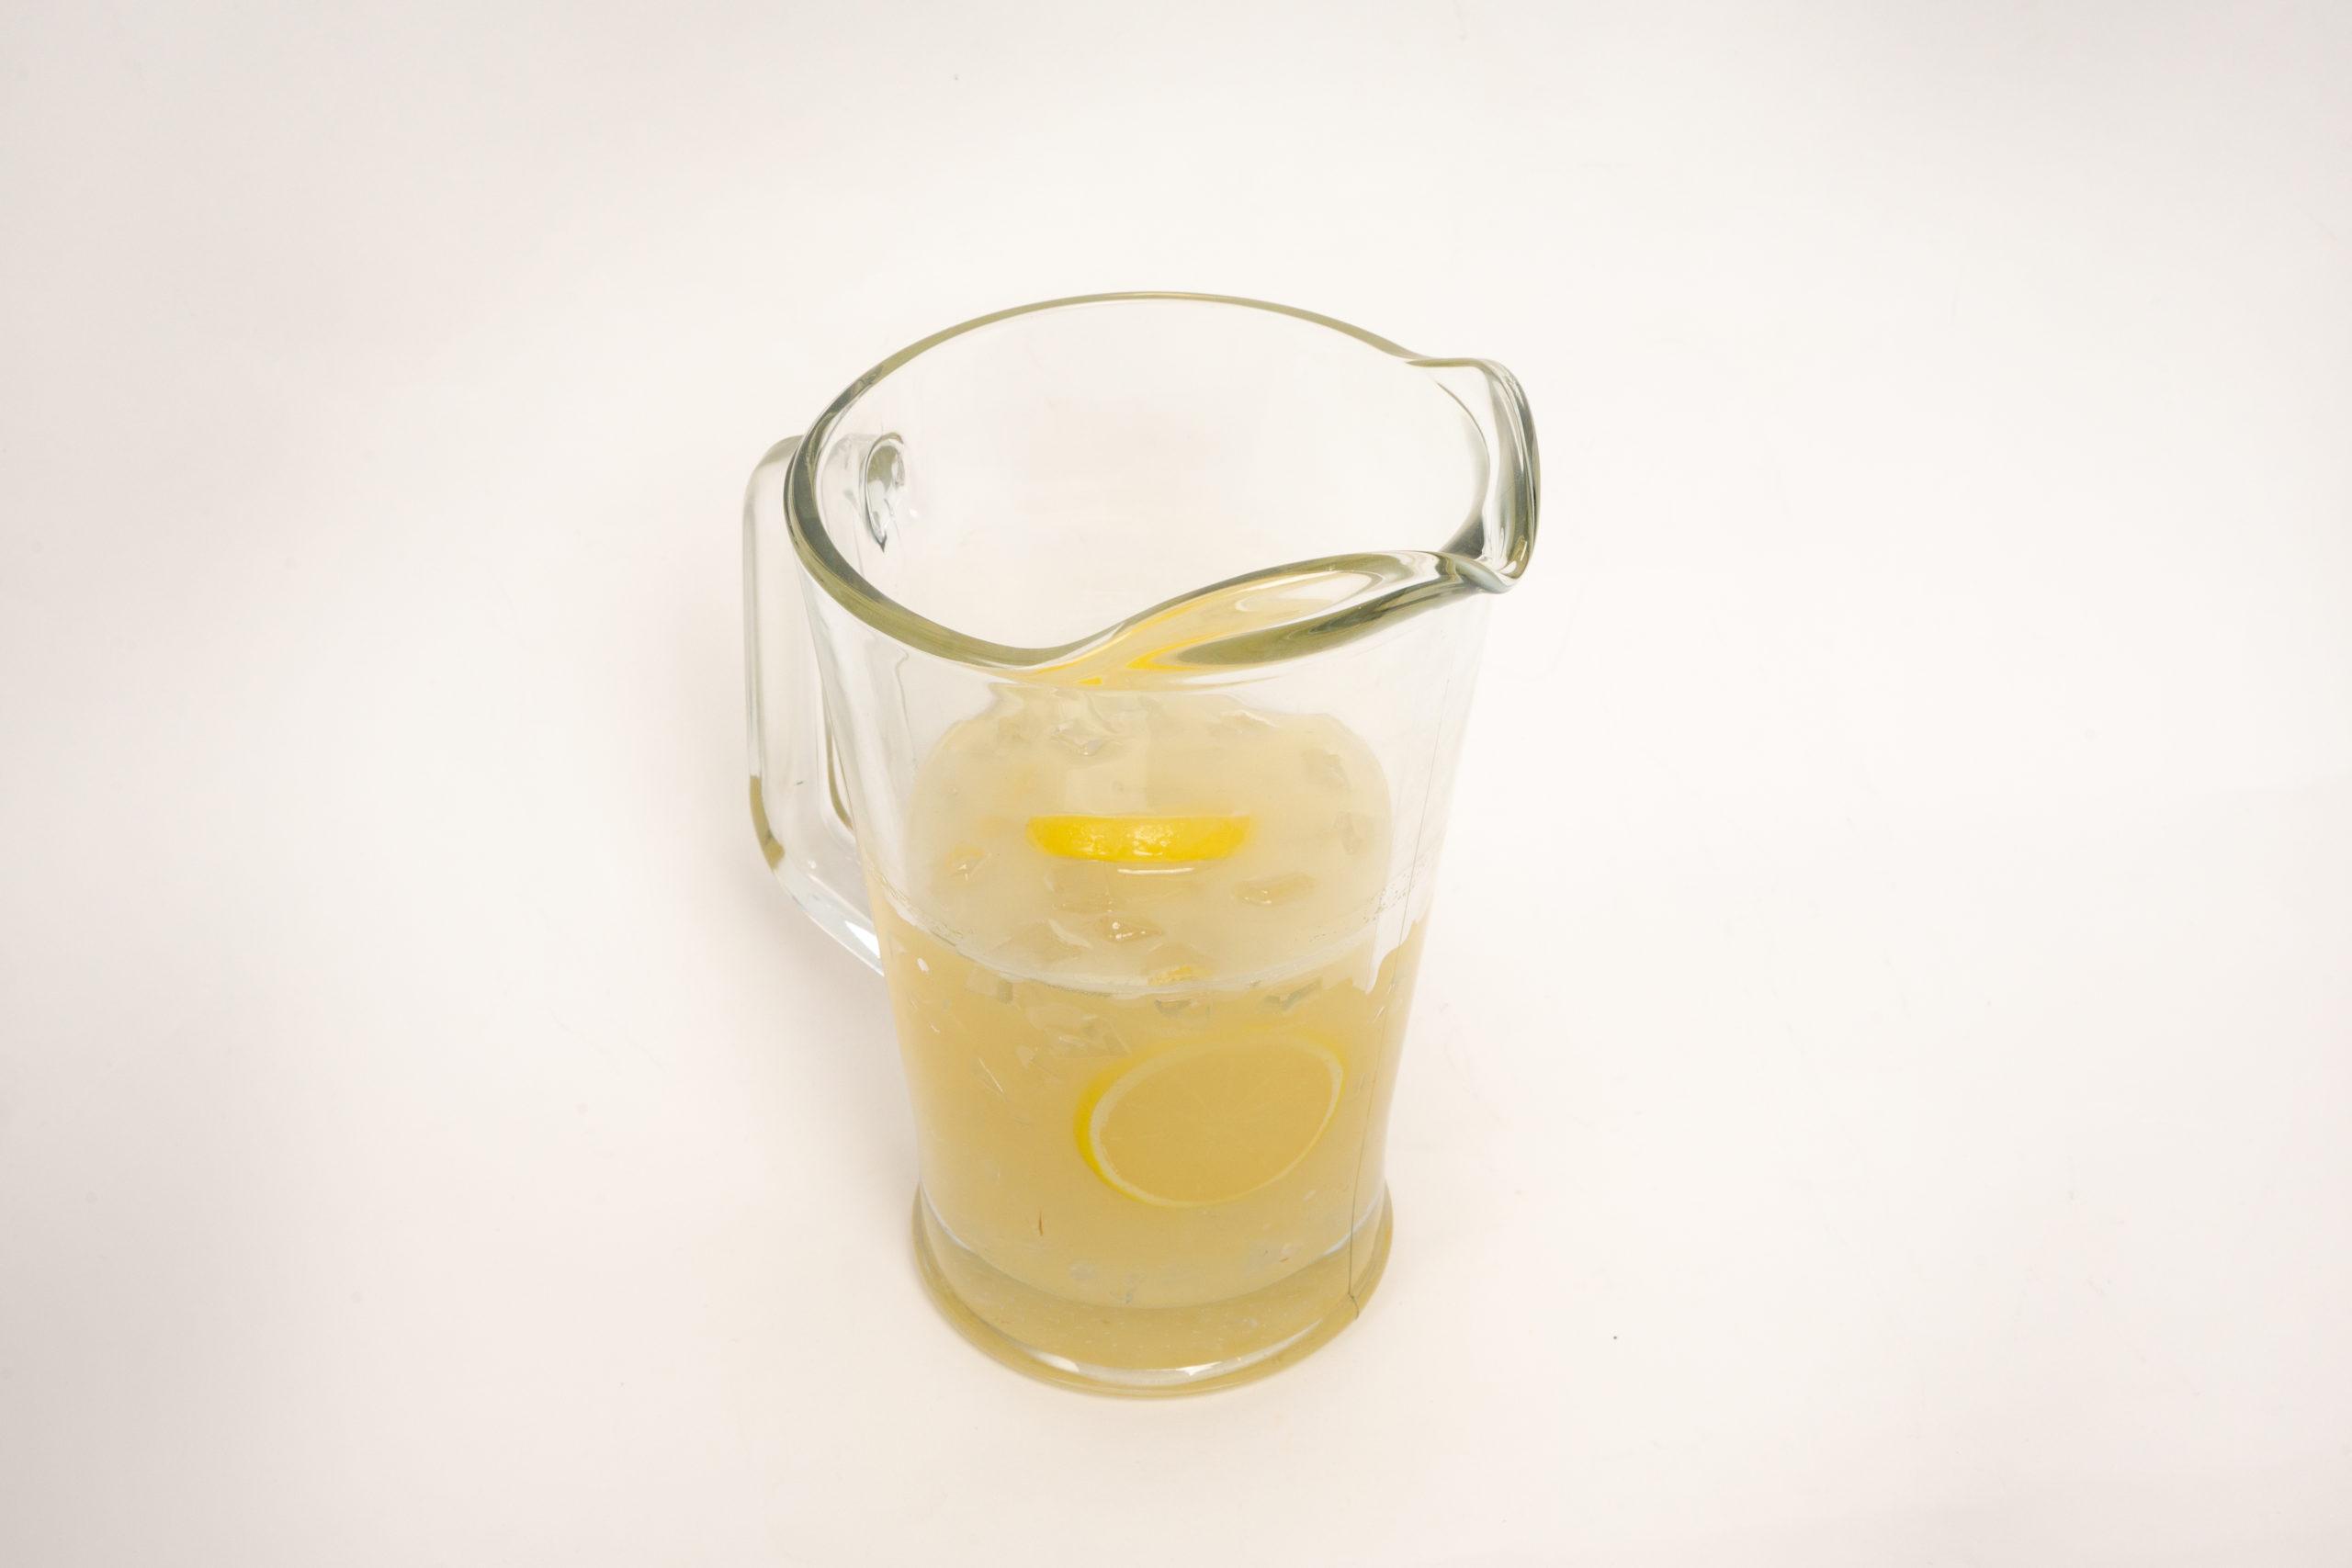 Party in the Pantry!: Herbal Lemonade |Real Pitcher Of Lemonade